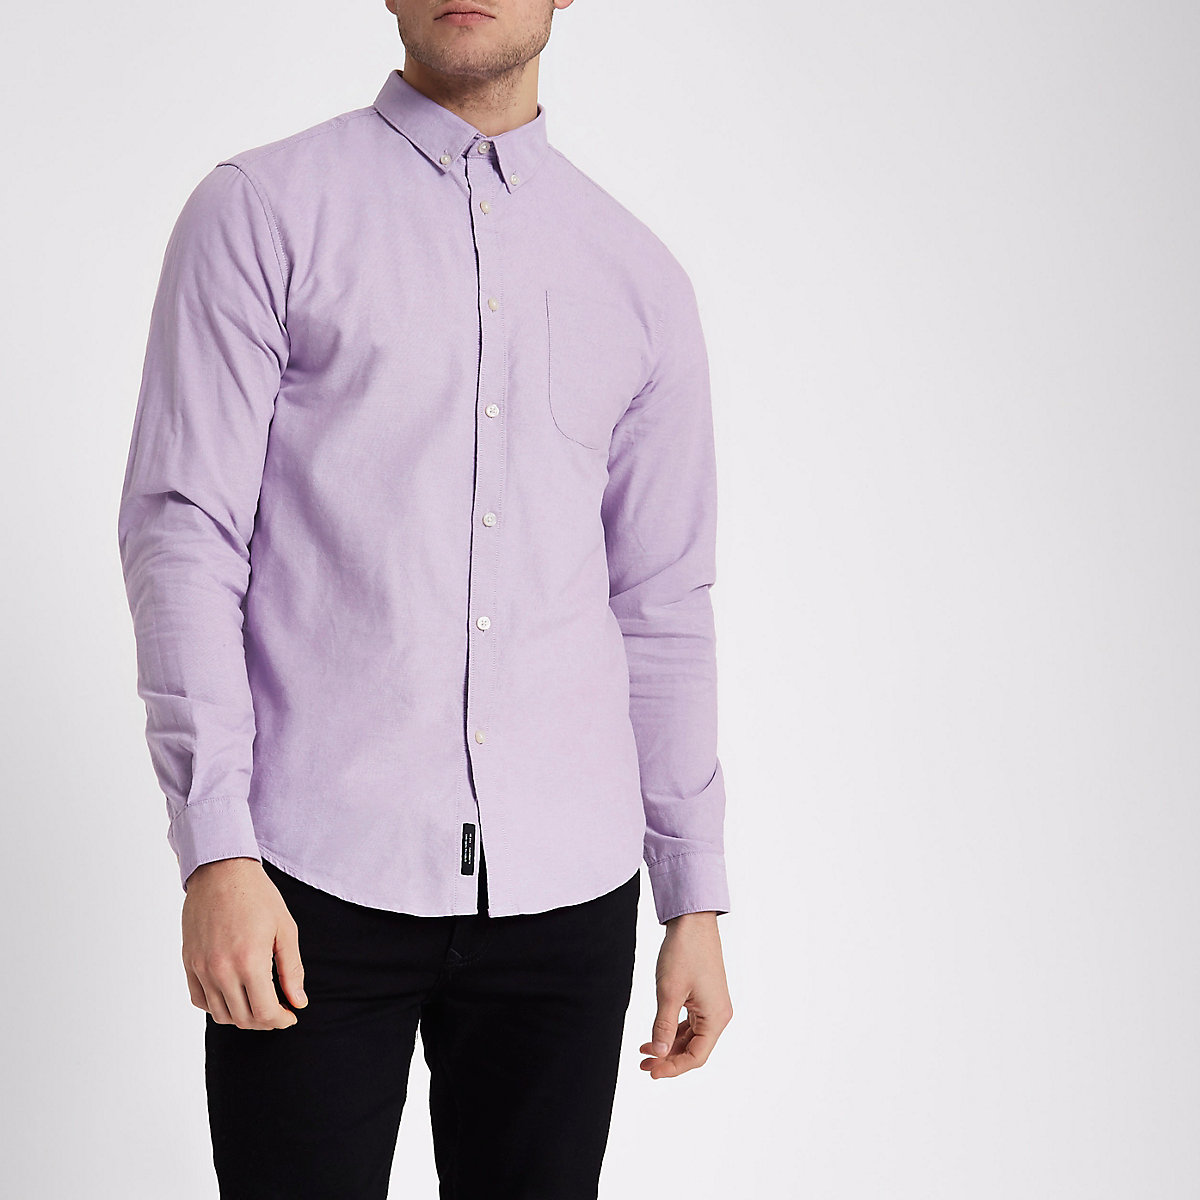 Lilac purple button-down Oxford shirt